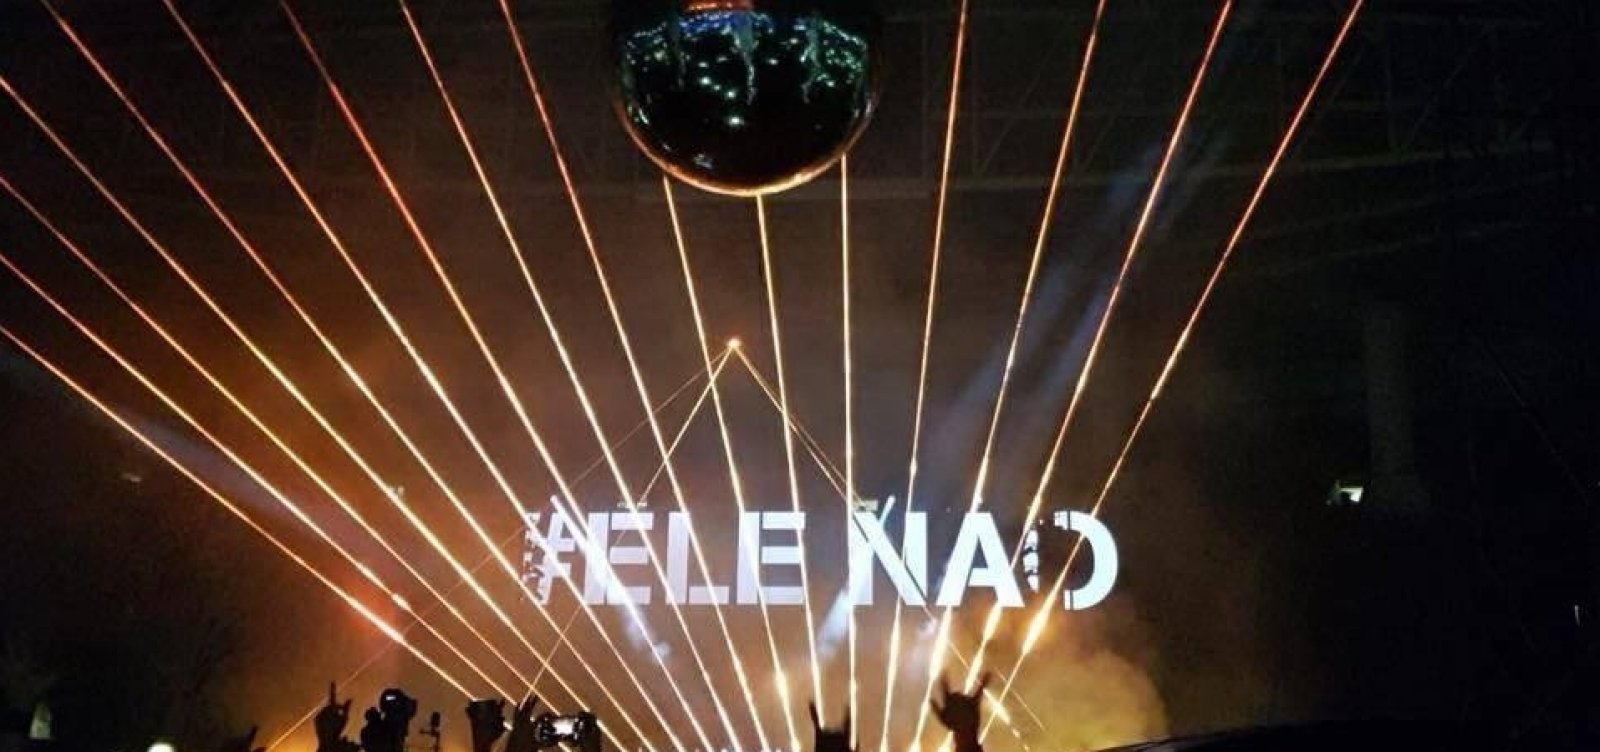 [Roger Waters critica Bolsonaro em show de abertura de turnê no Brasil]